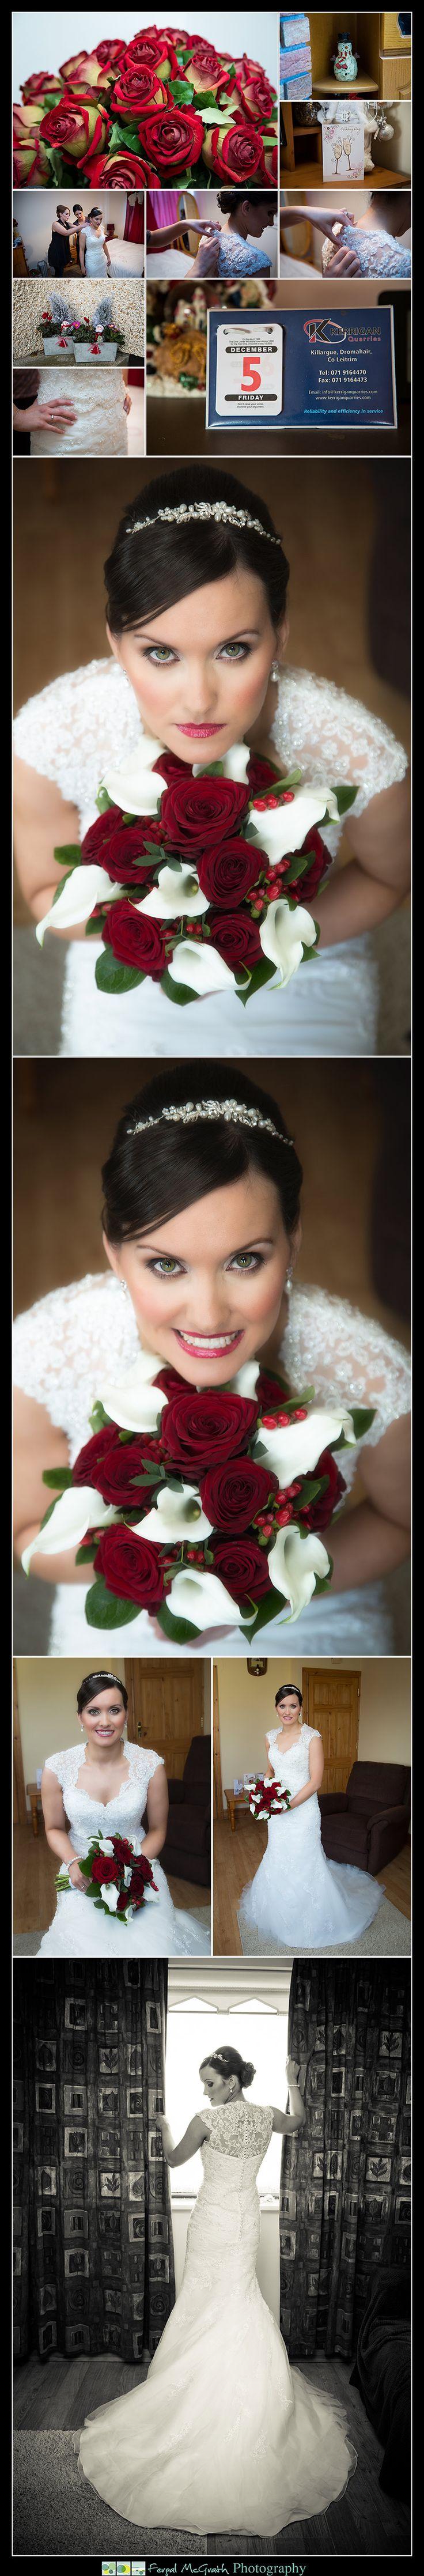 radisson blu hotel sligo wedding beautiful bridal portraits of the bride on her wedding day